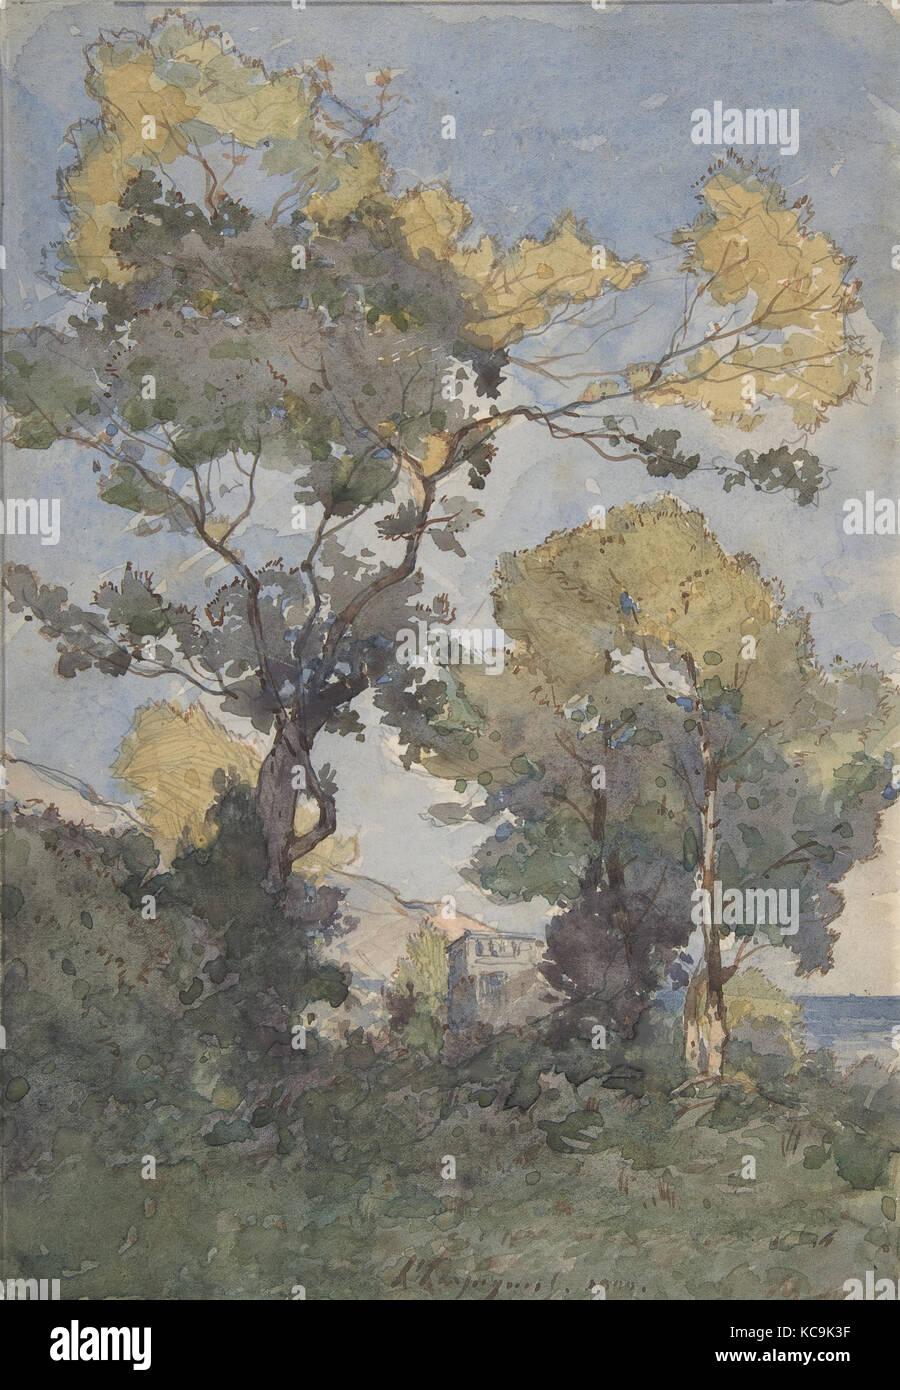 Landscape, 1900, Watercolor, graphite, Overall: 11 1/16 x 7 13/16in. (28.1 x 19.8cm), Drawings, Henri-Joseph Harpignies - Stock Image